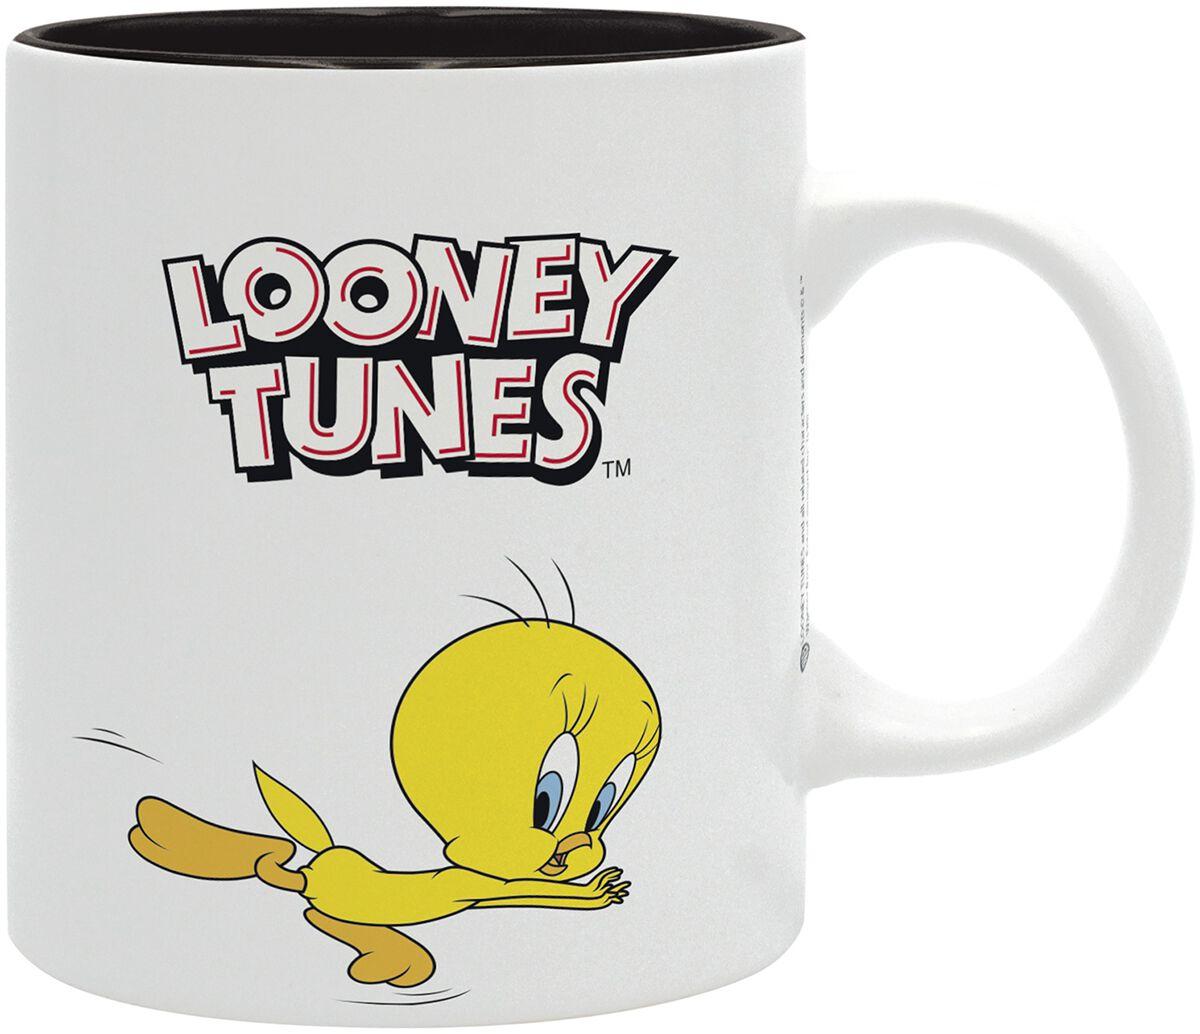 Looney Tunes Tweety Silvester Tasse multicolor ABYMUG890